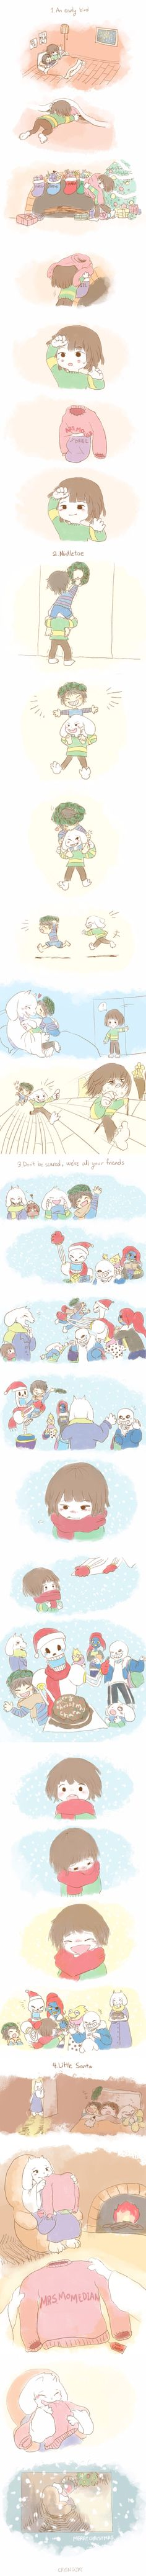 Undertale - comic - Christmas